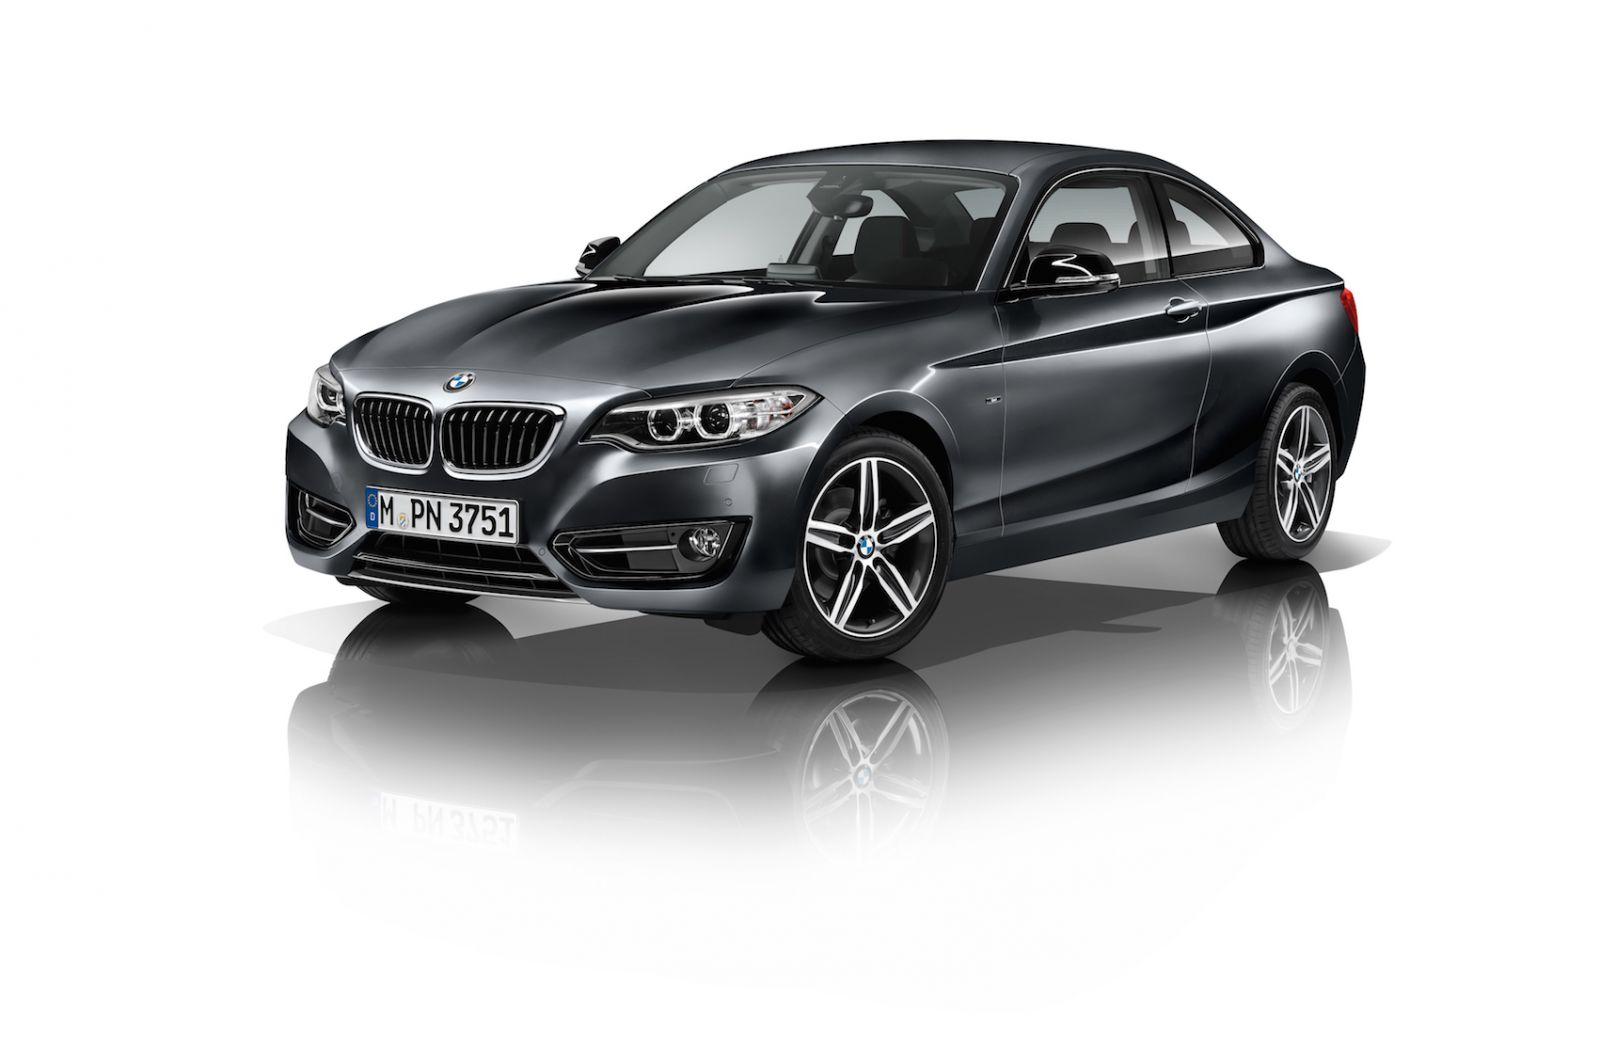 250kW/ M240i Headlines 2017 BMW 2 Series Range - Price And Features For Australia